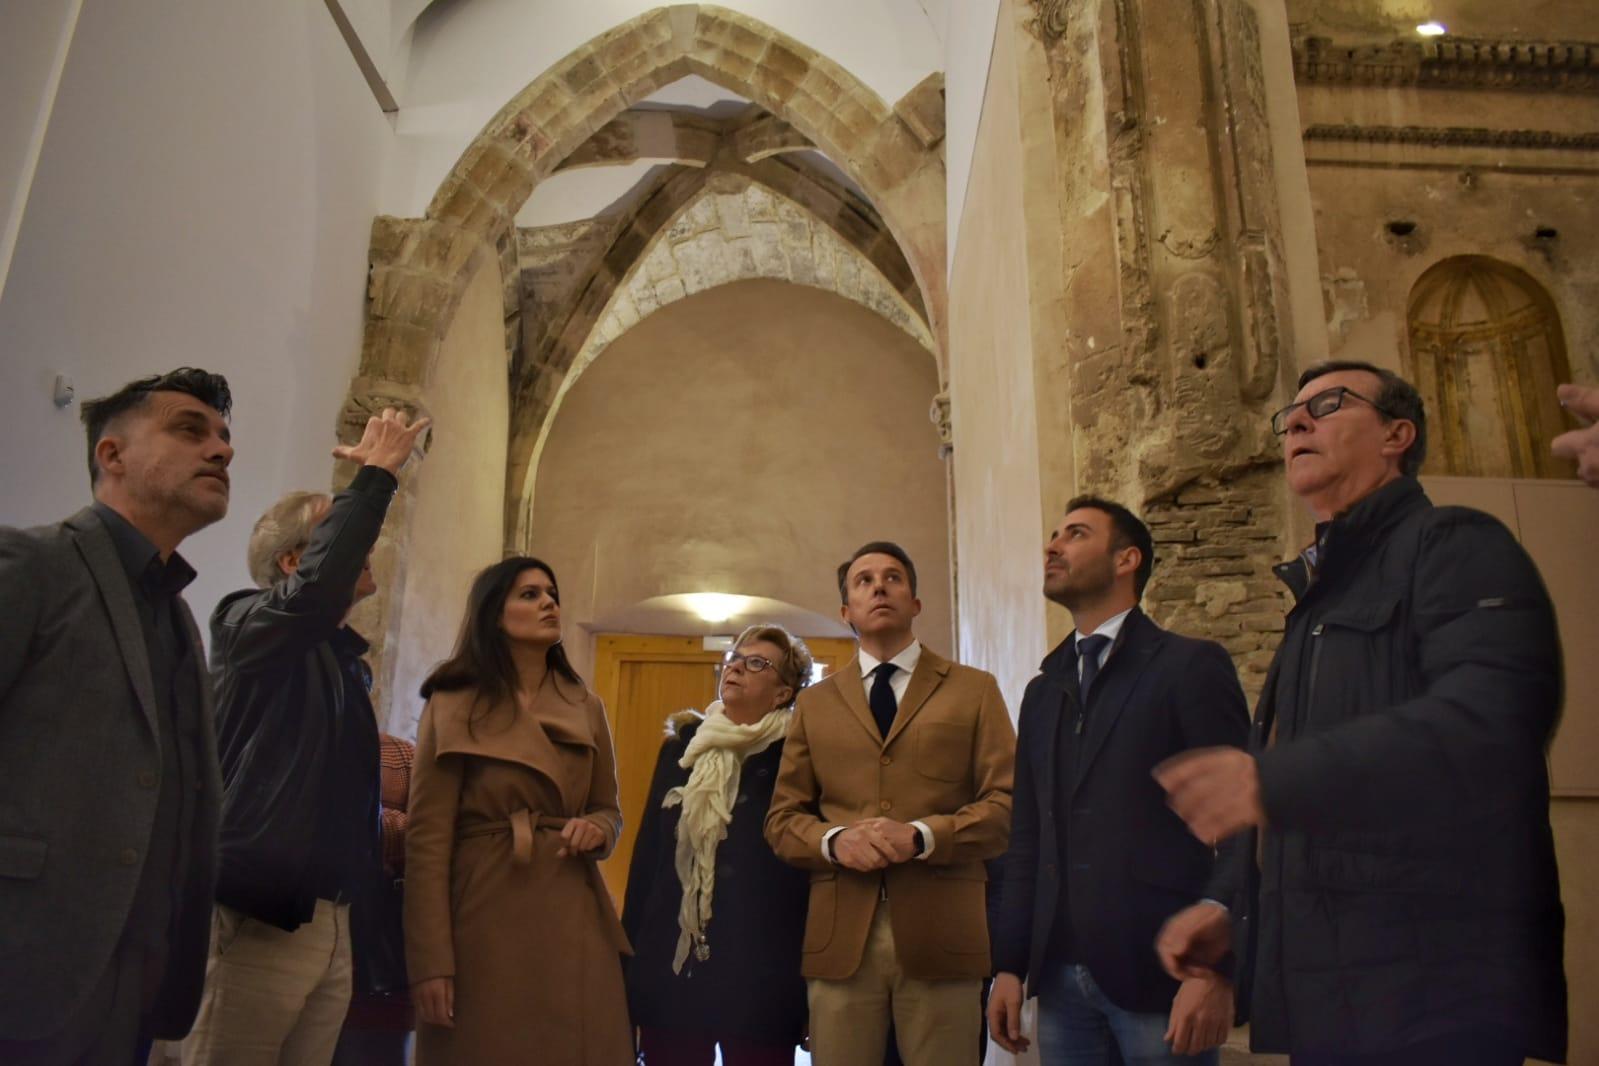 La iglesia de San Pedro recupera su espacio arquitectónico primitivo